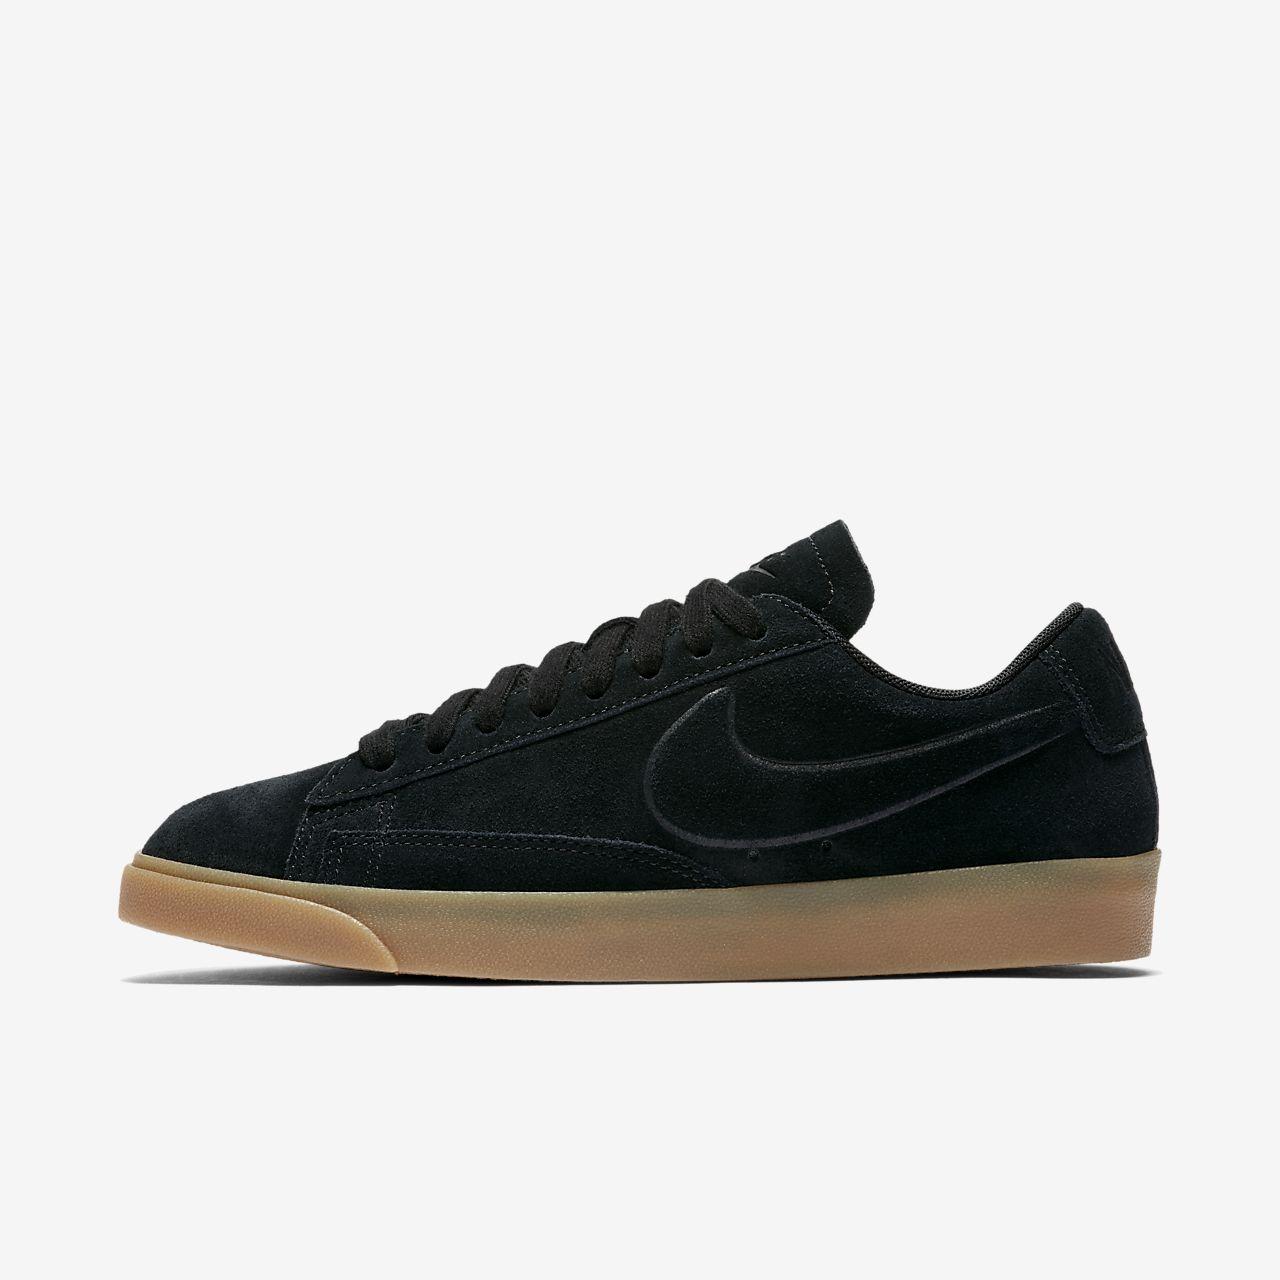 Nike Blazer Low Black Gum Light Brown Black AA3962002